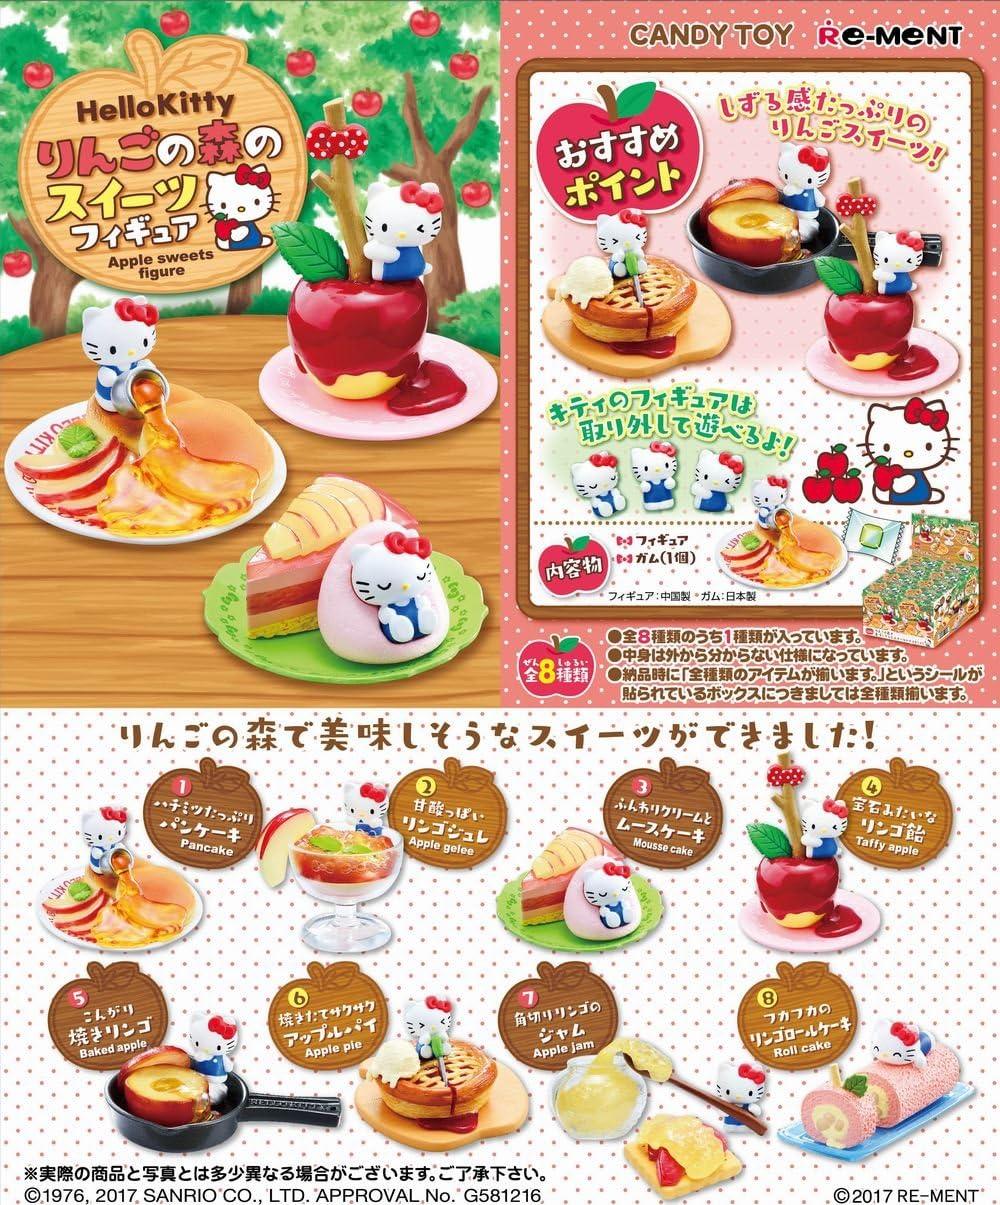 Re-Ment Miniature Sanrio Rilakkuma Sweets in dream Full set of 8 pieces